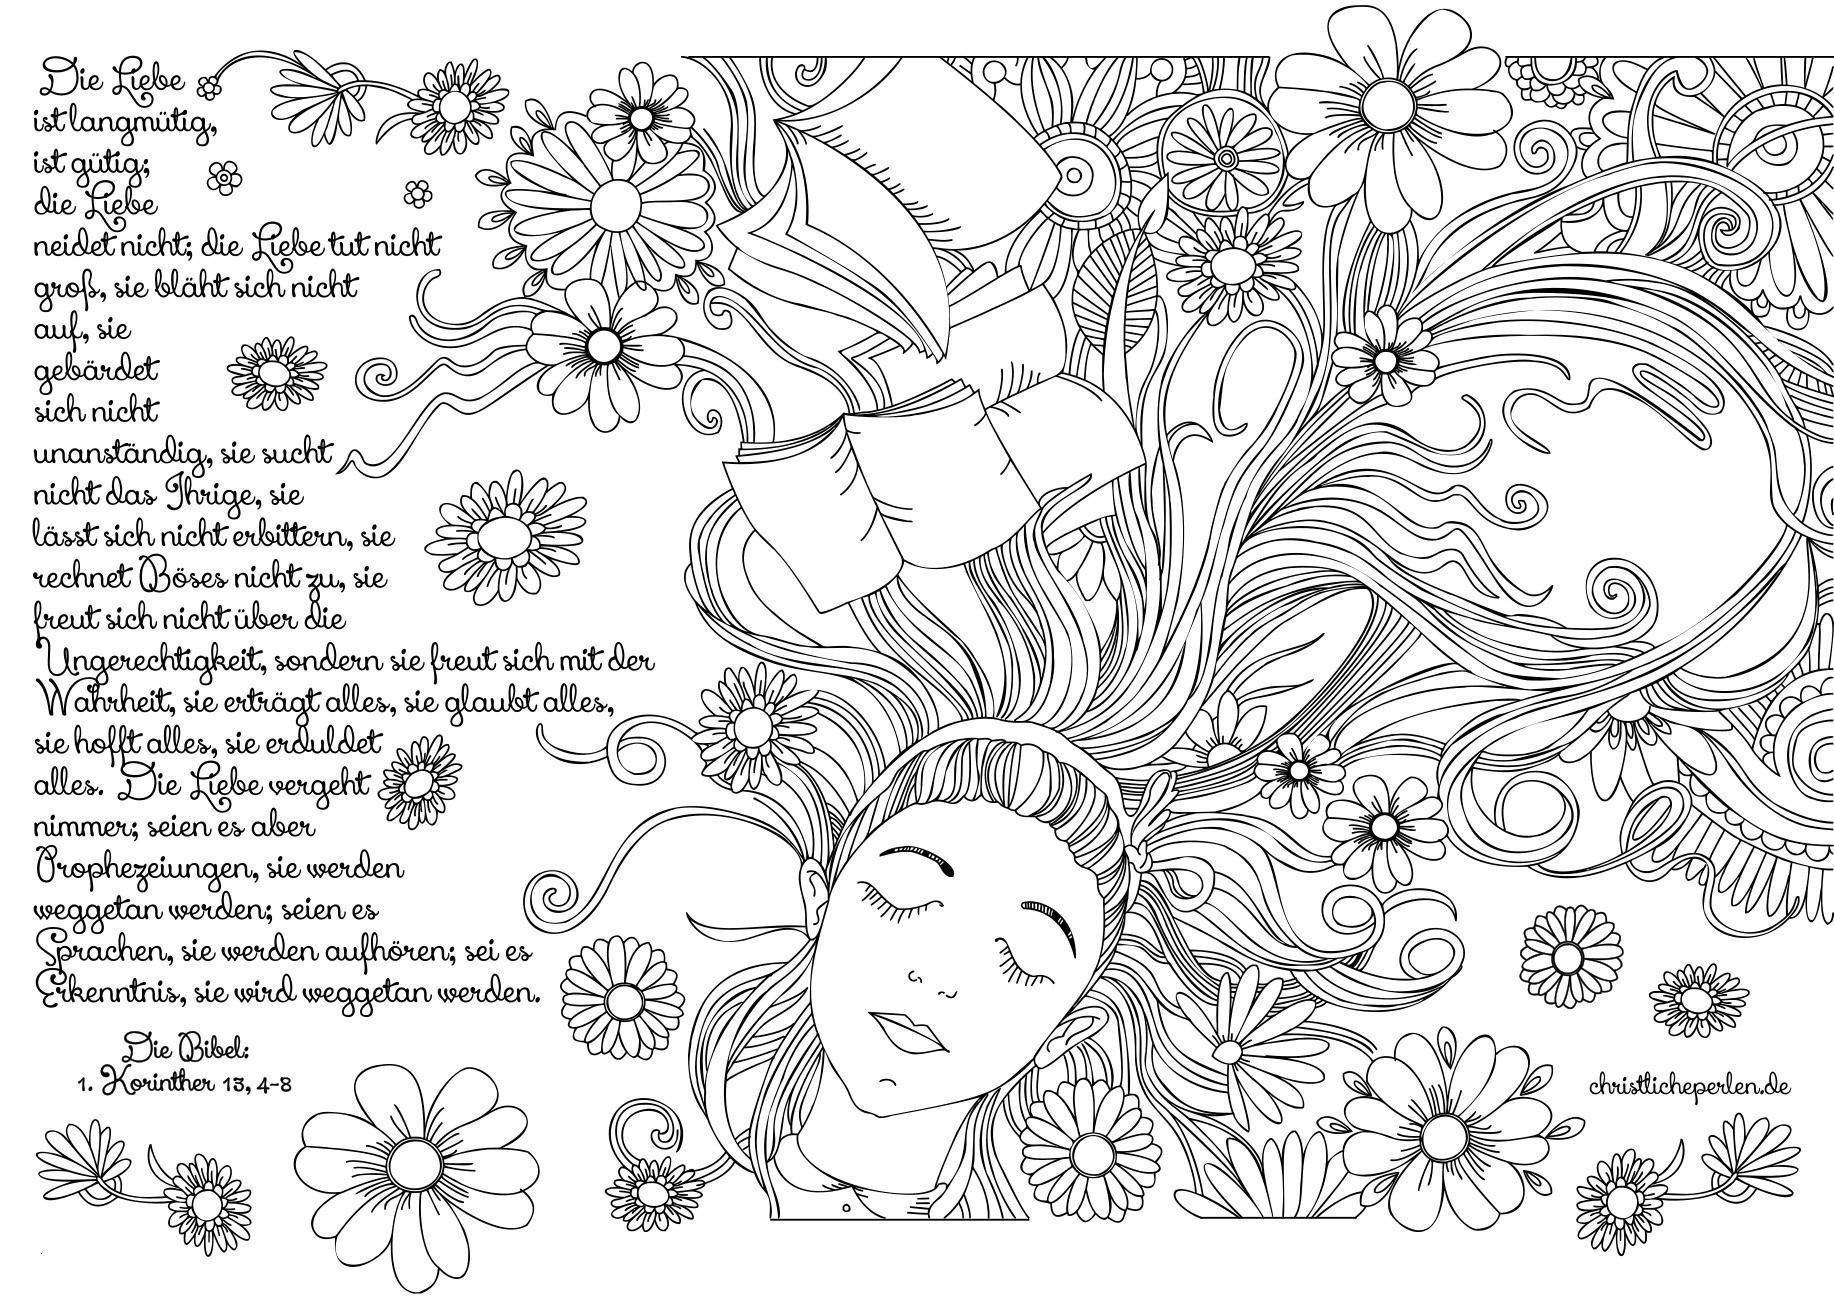 Ausmalbild Mandala Eule Neu Malvorlagen Ausmalbilder Best Ausmalbilder Mandala Kostenlos Eule Bilder